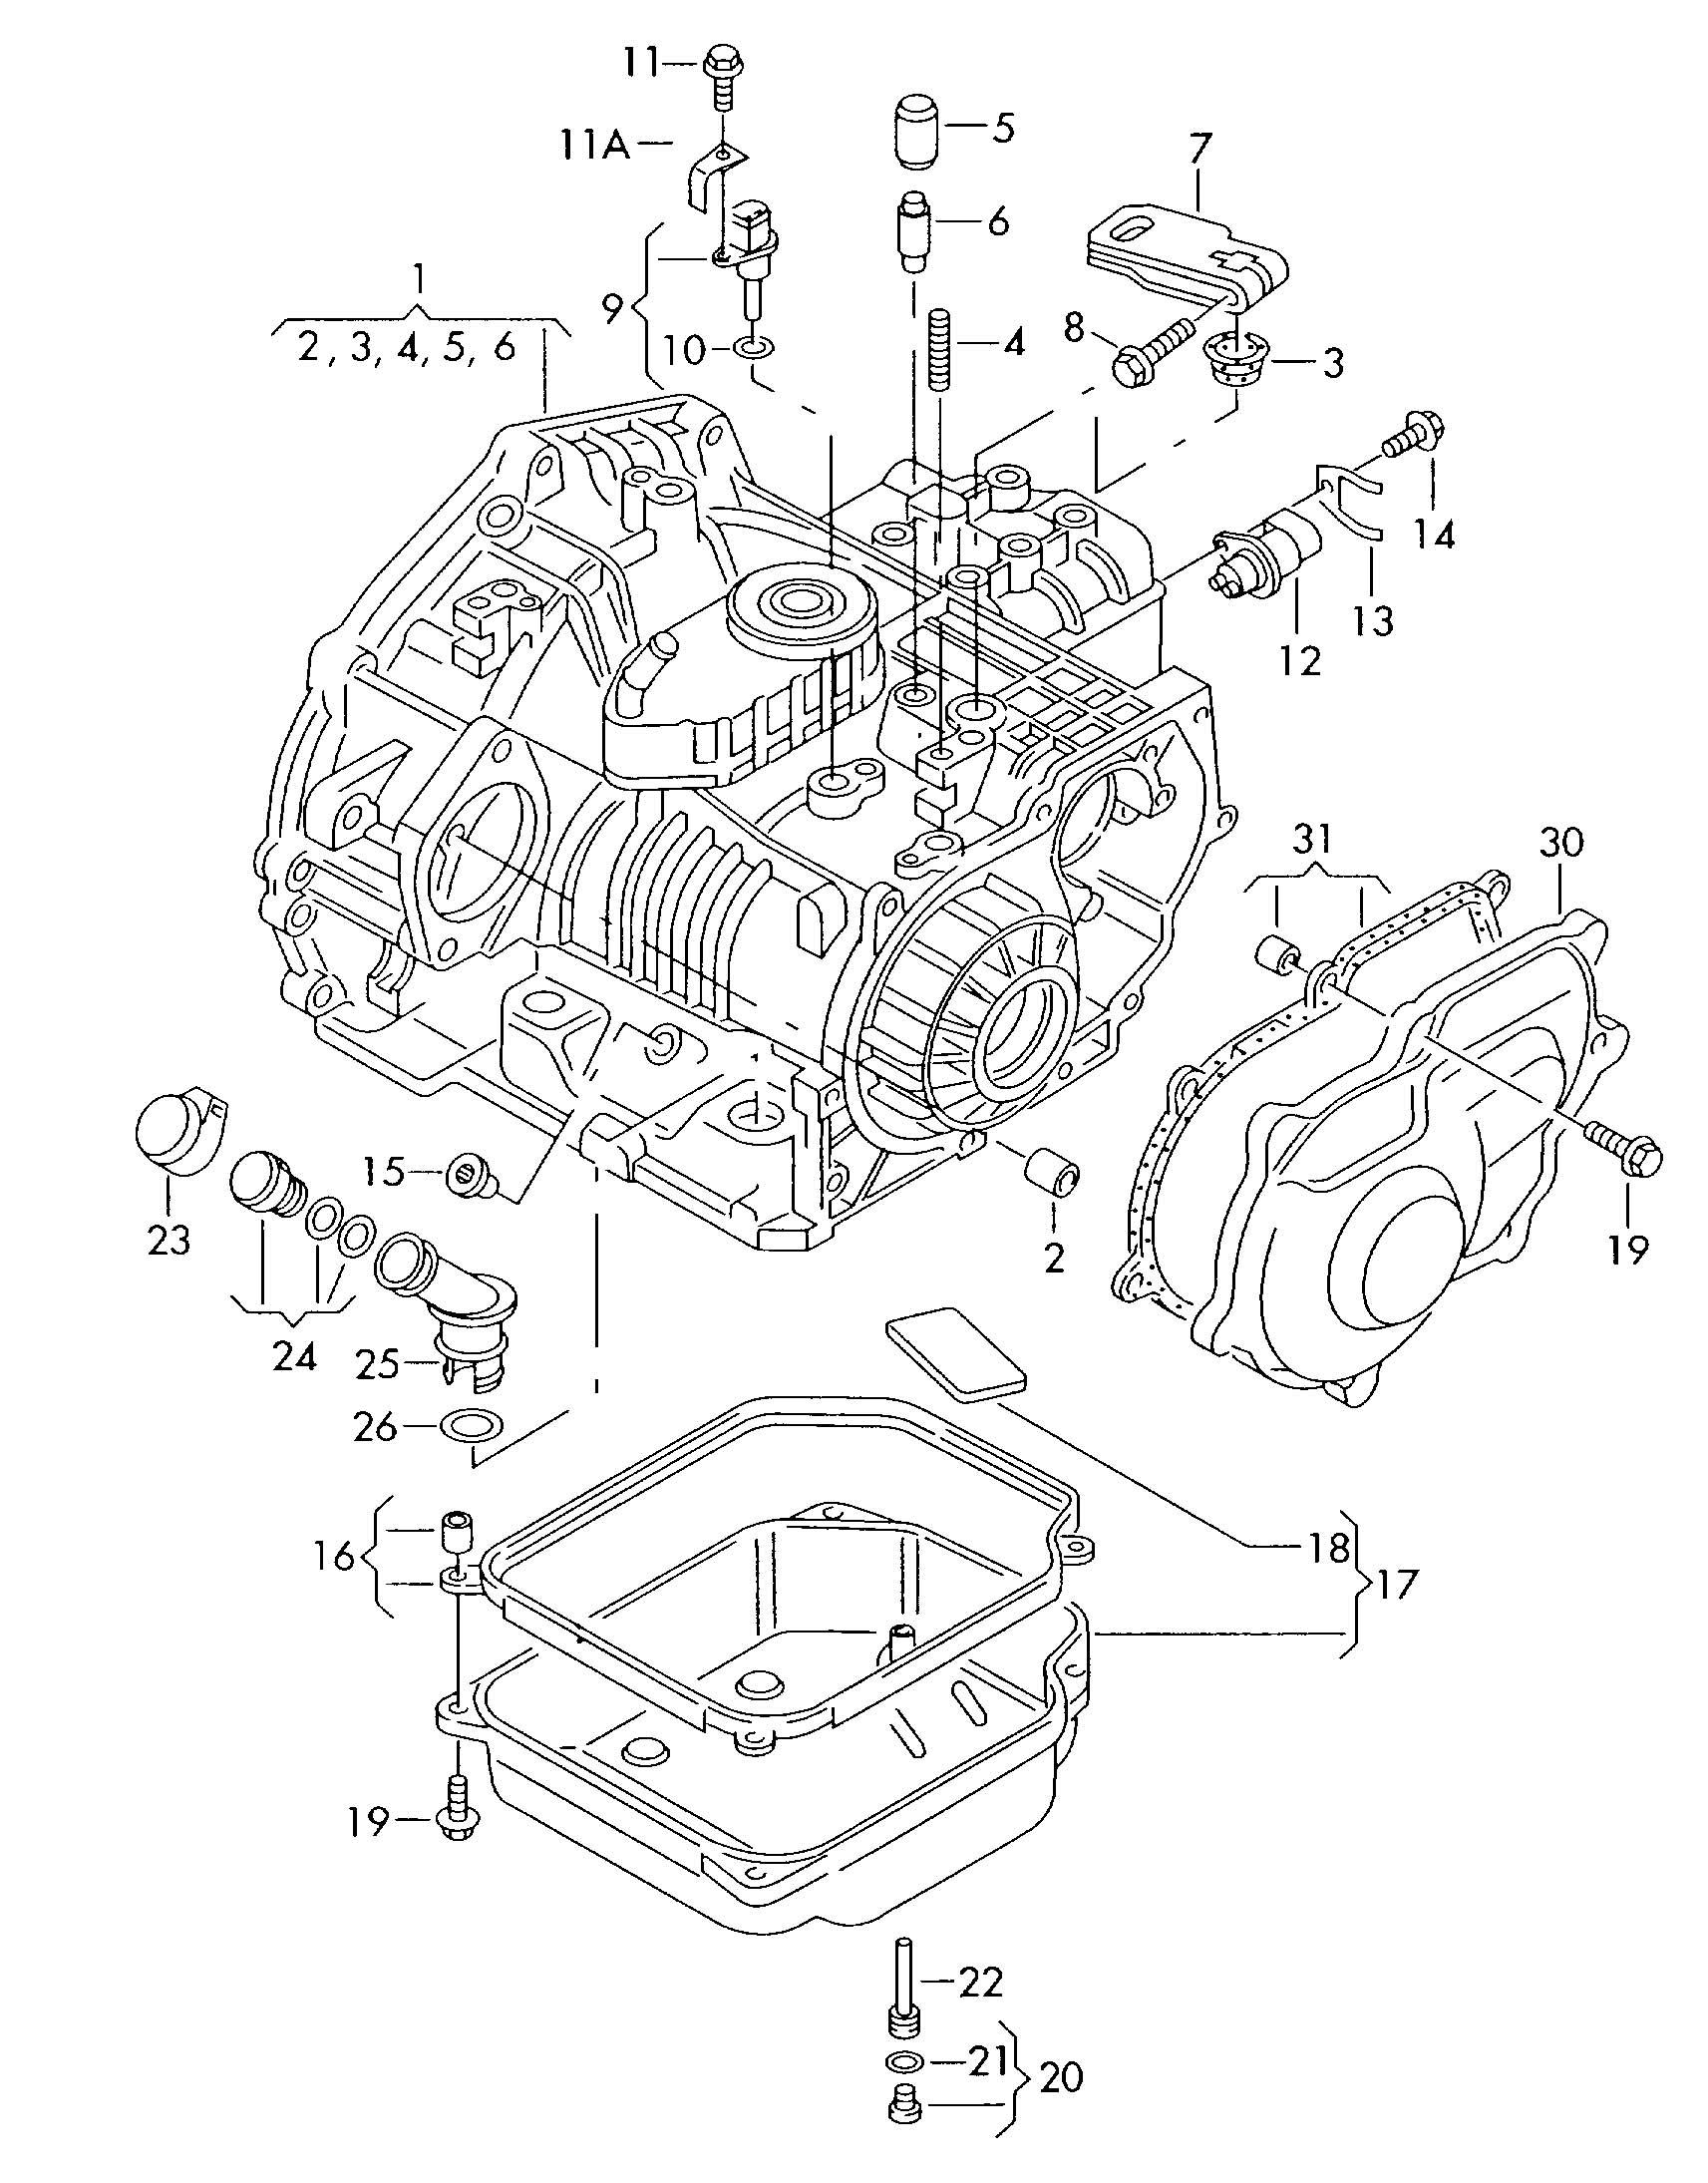 Transmission Case For 4 Speed Automatic Transm 2 0ltr